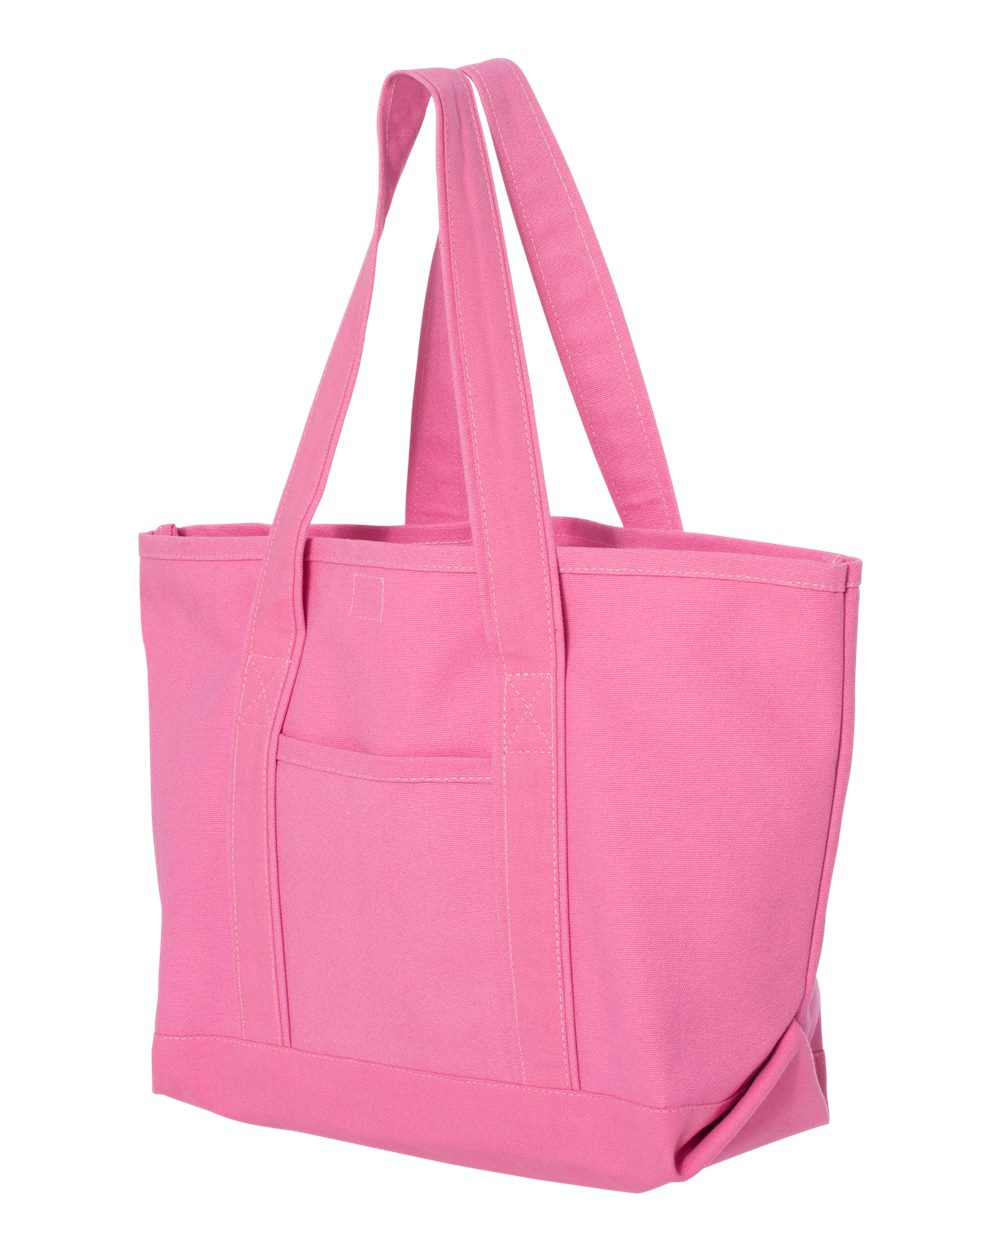 click to view Flamingo/ Flamingo